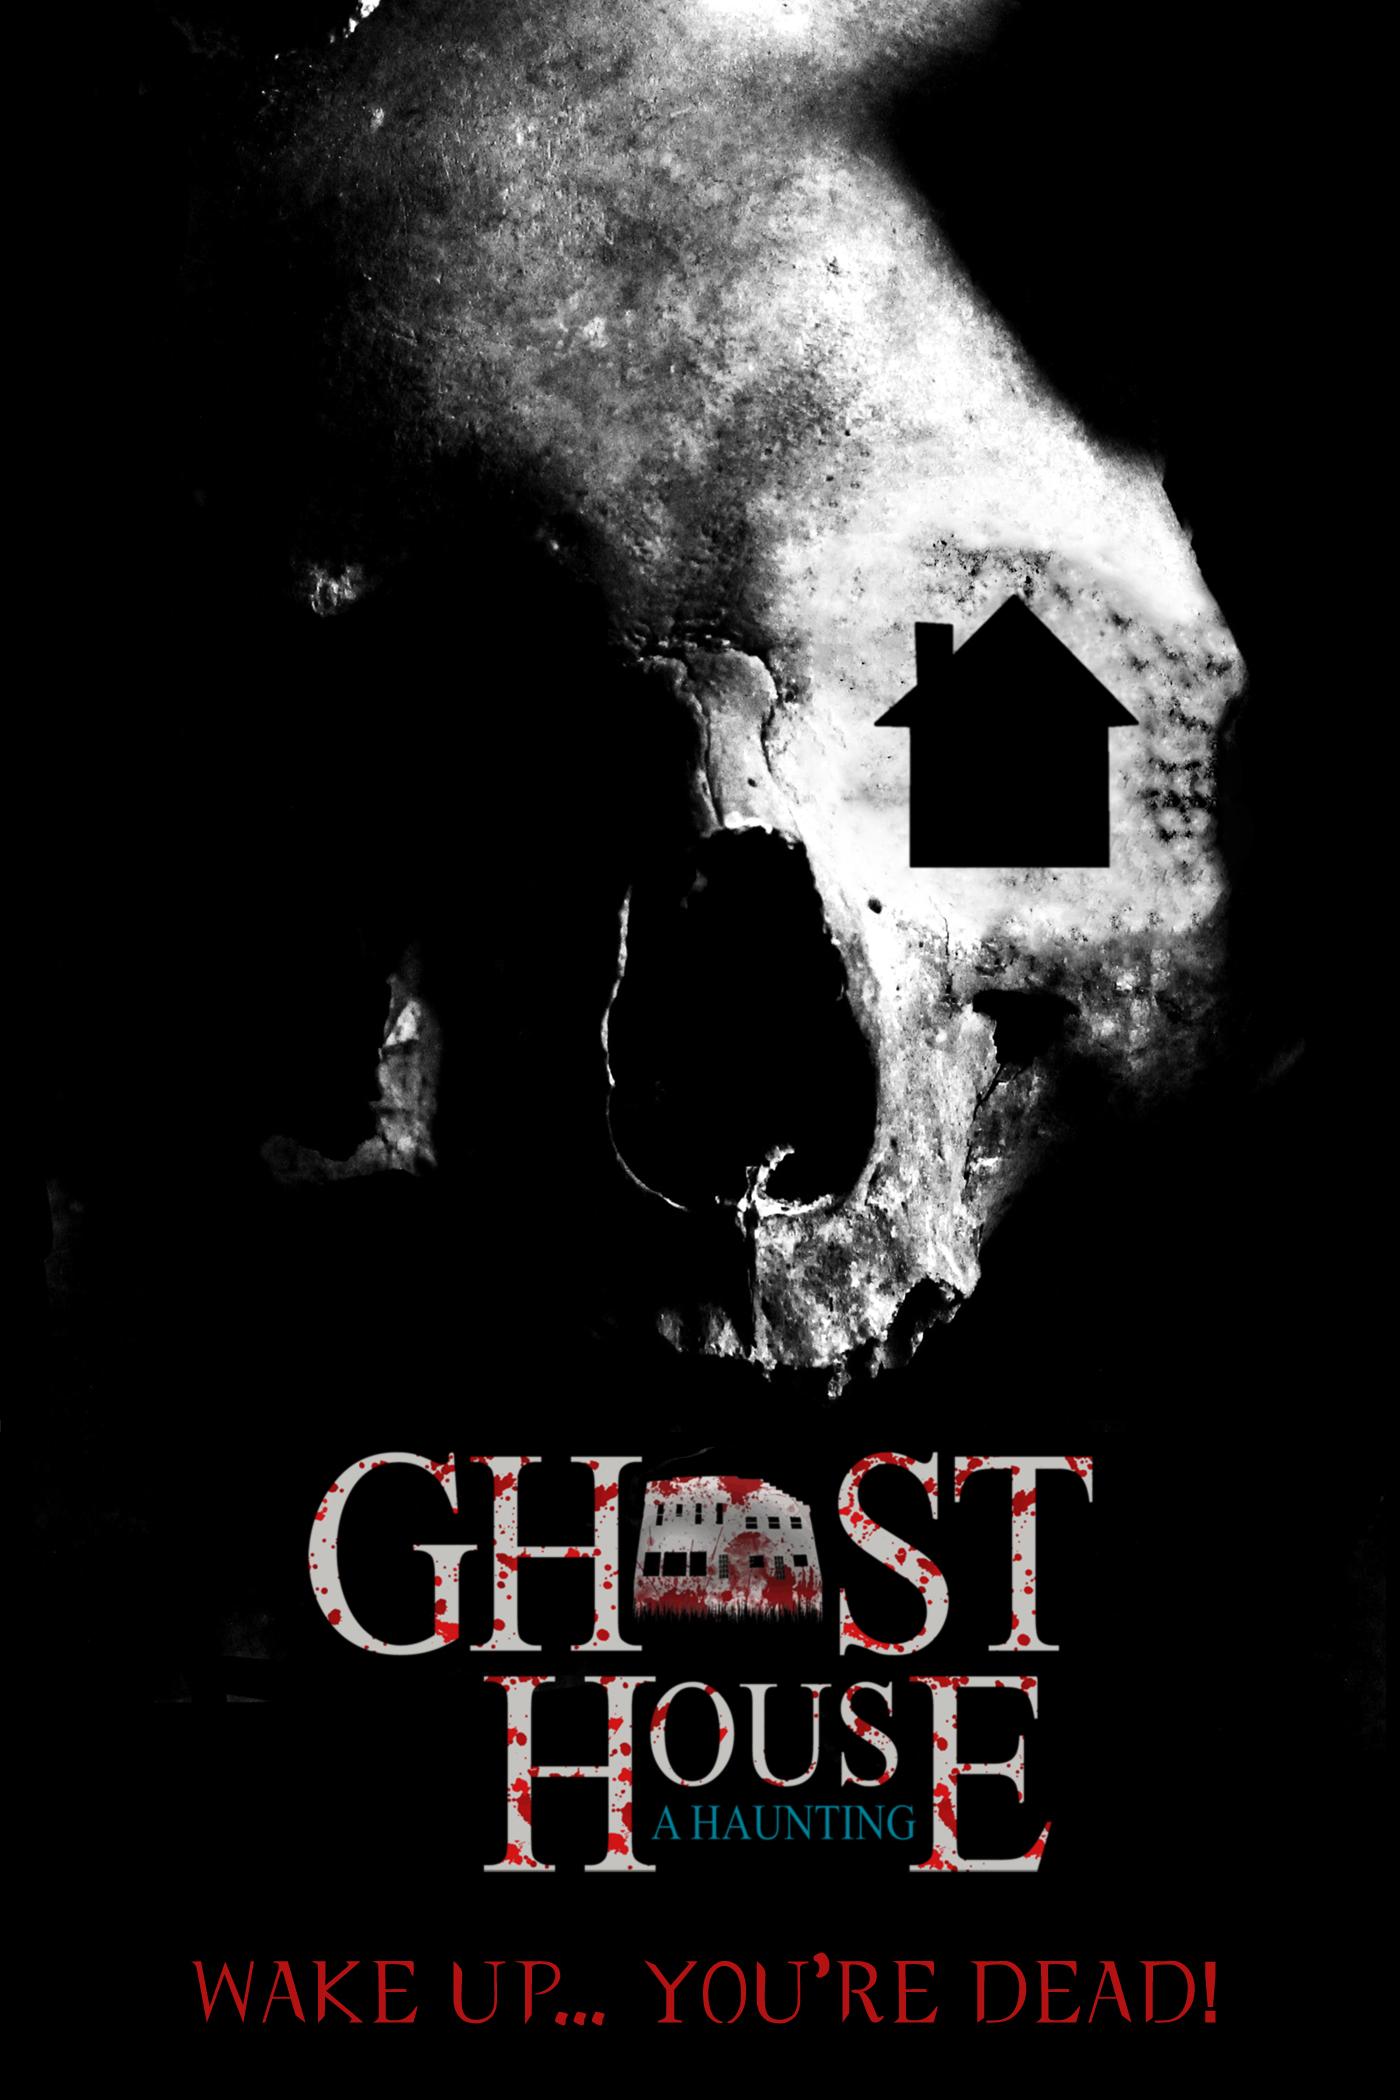 Ghost House: A Haunting (2018) - IMDb